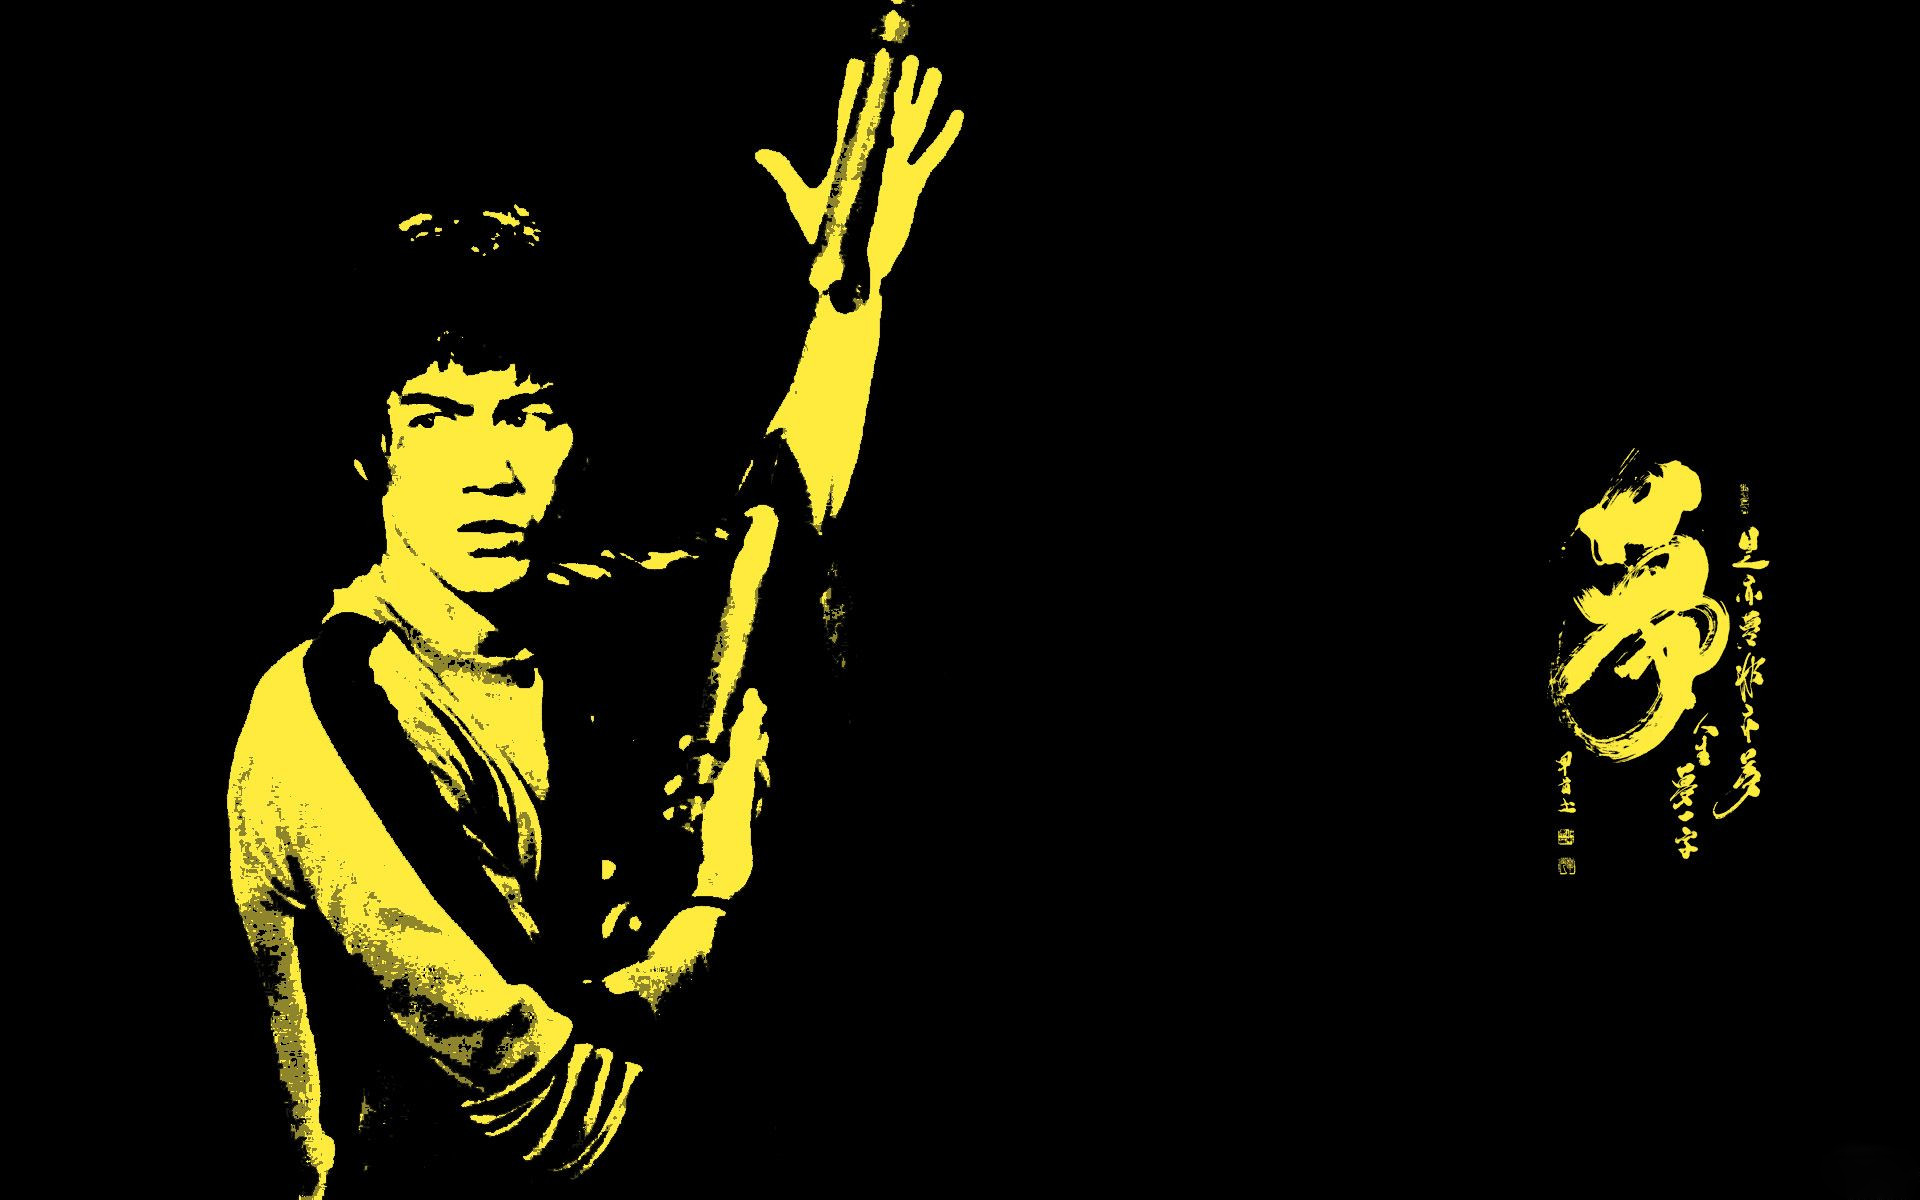 Bruce Lee.Hd